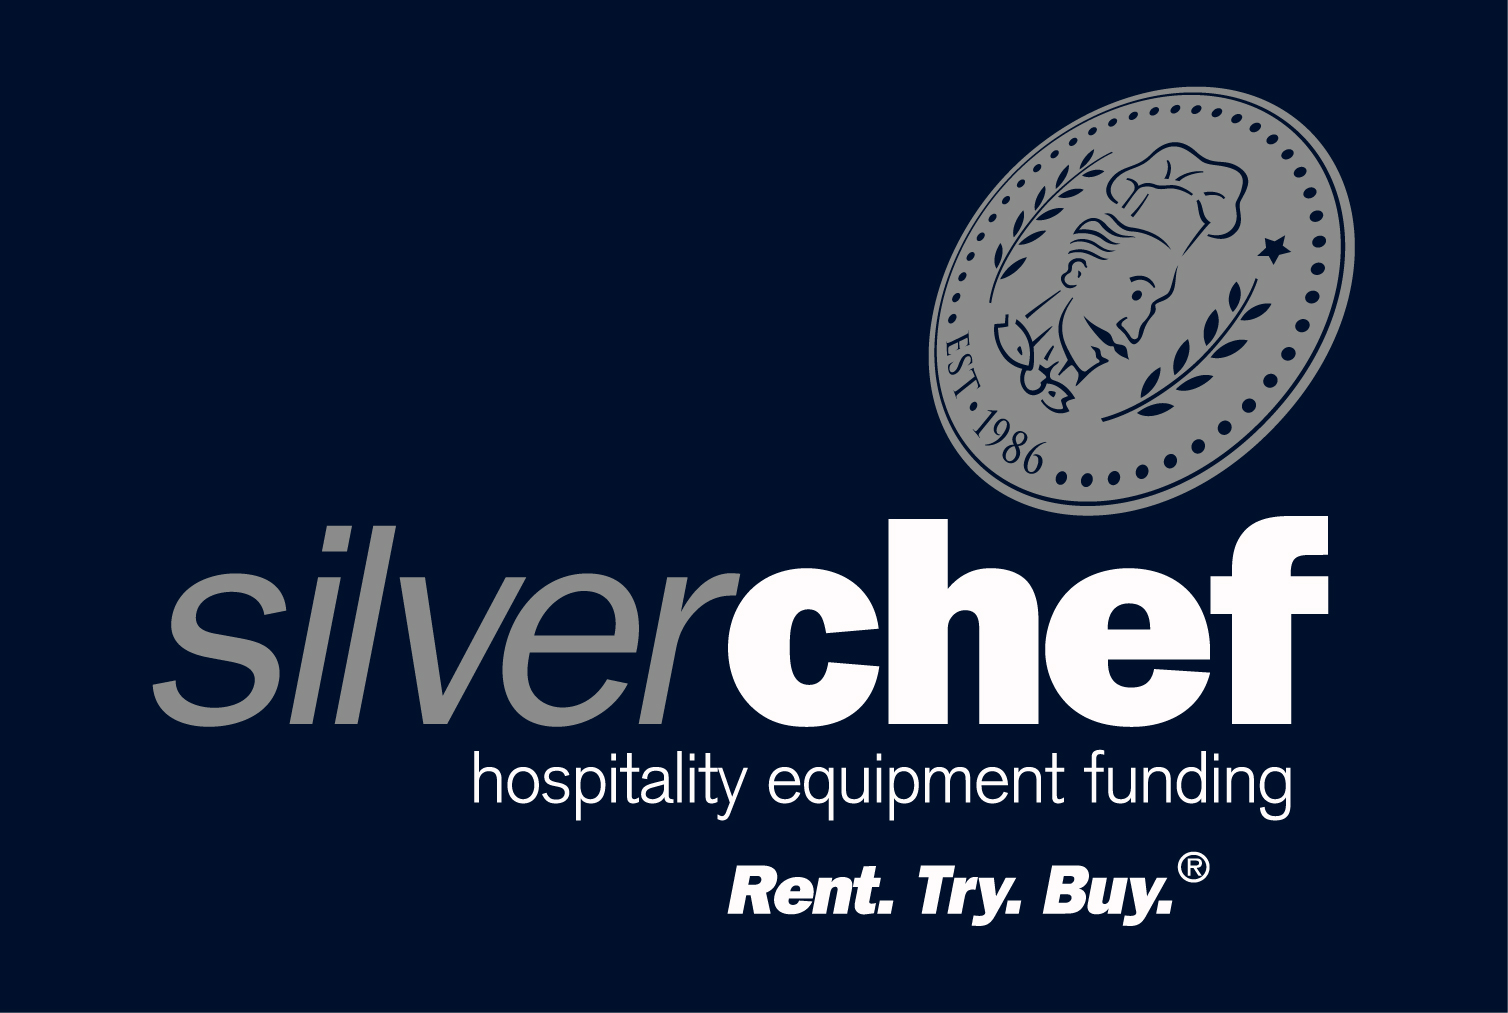 silverchef-rgb-rev.jpg